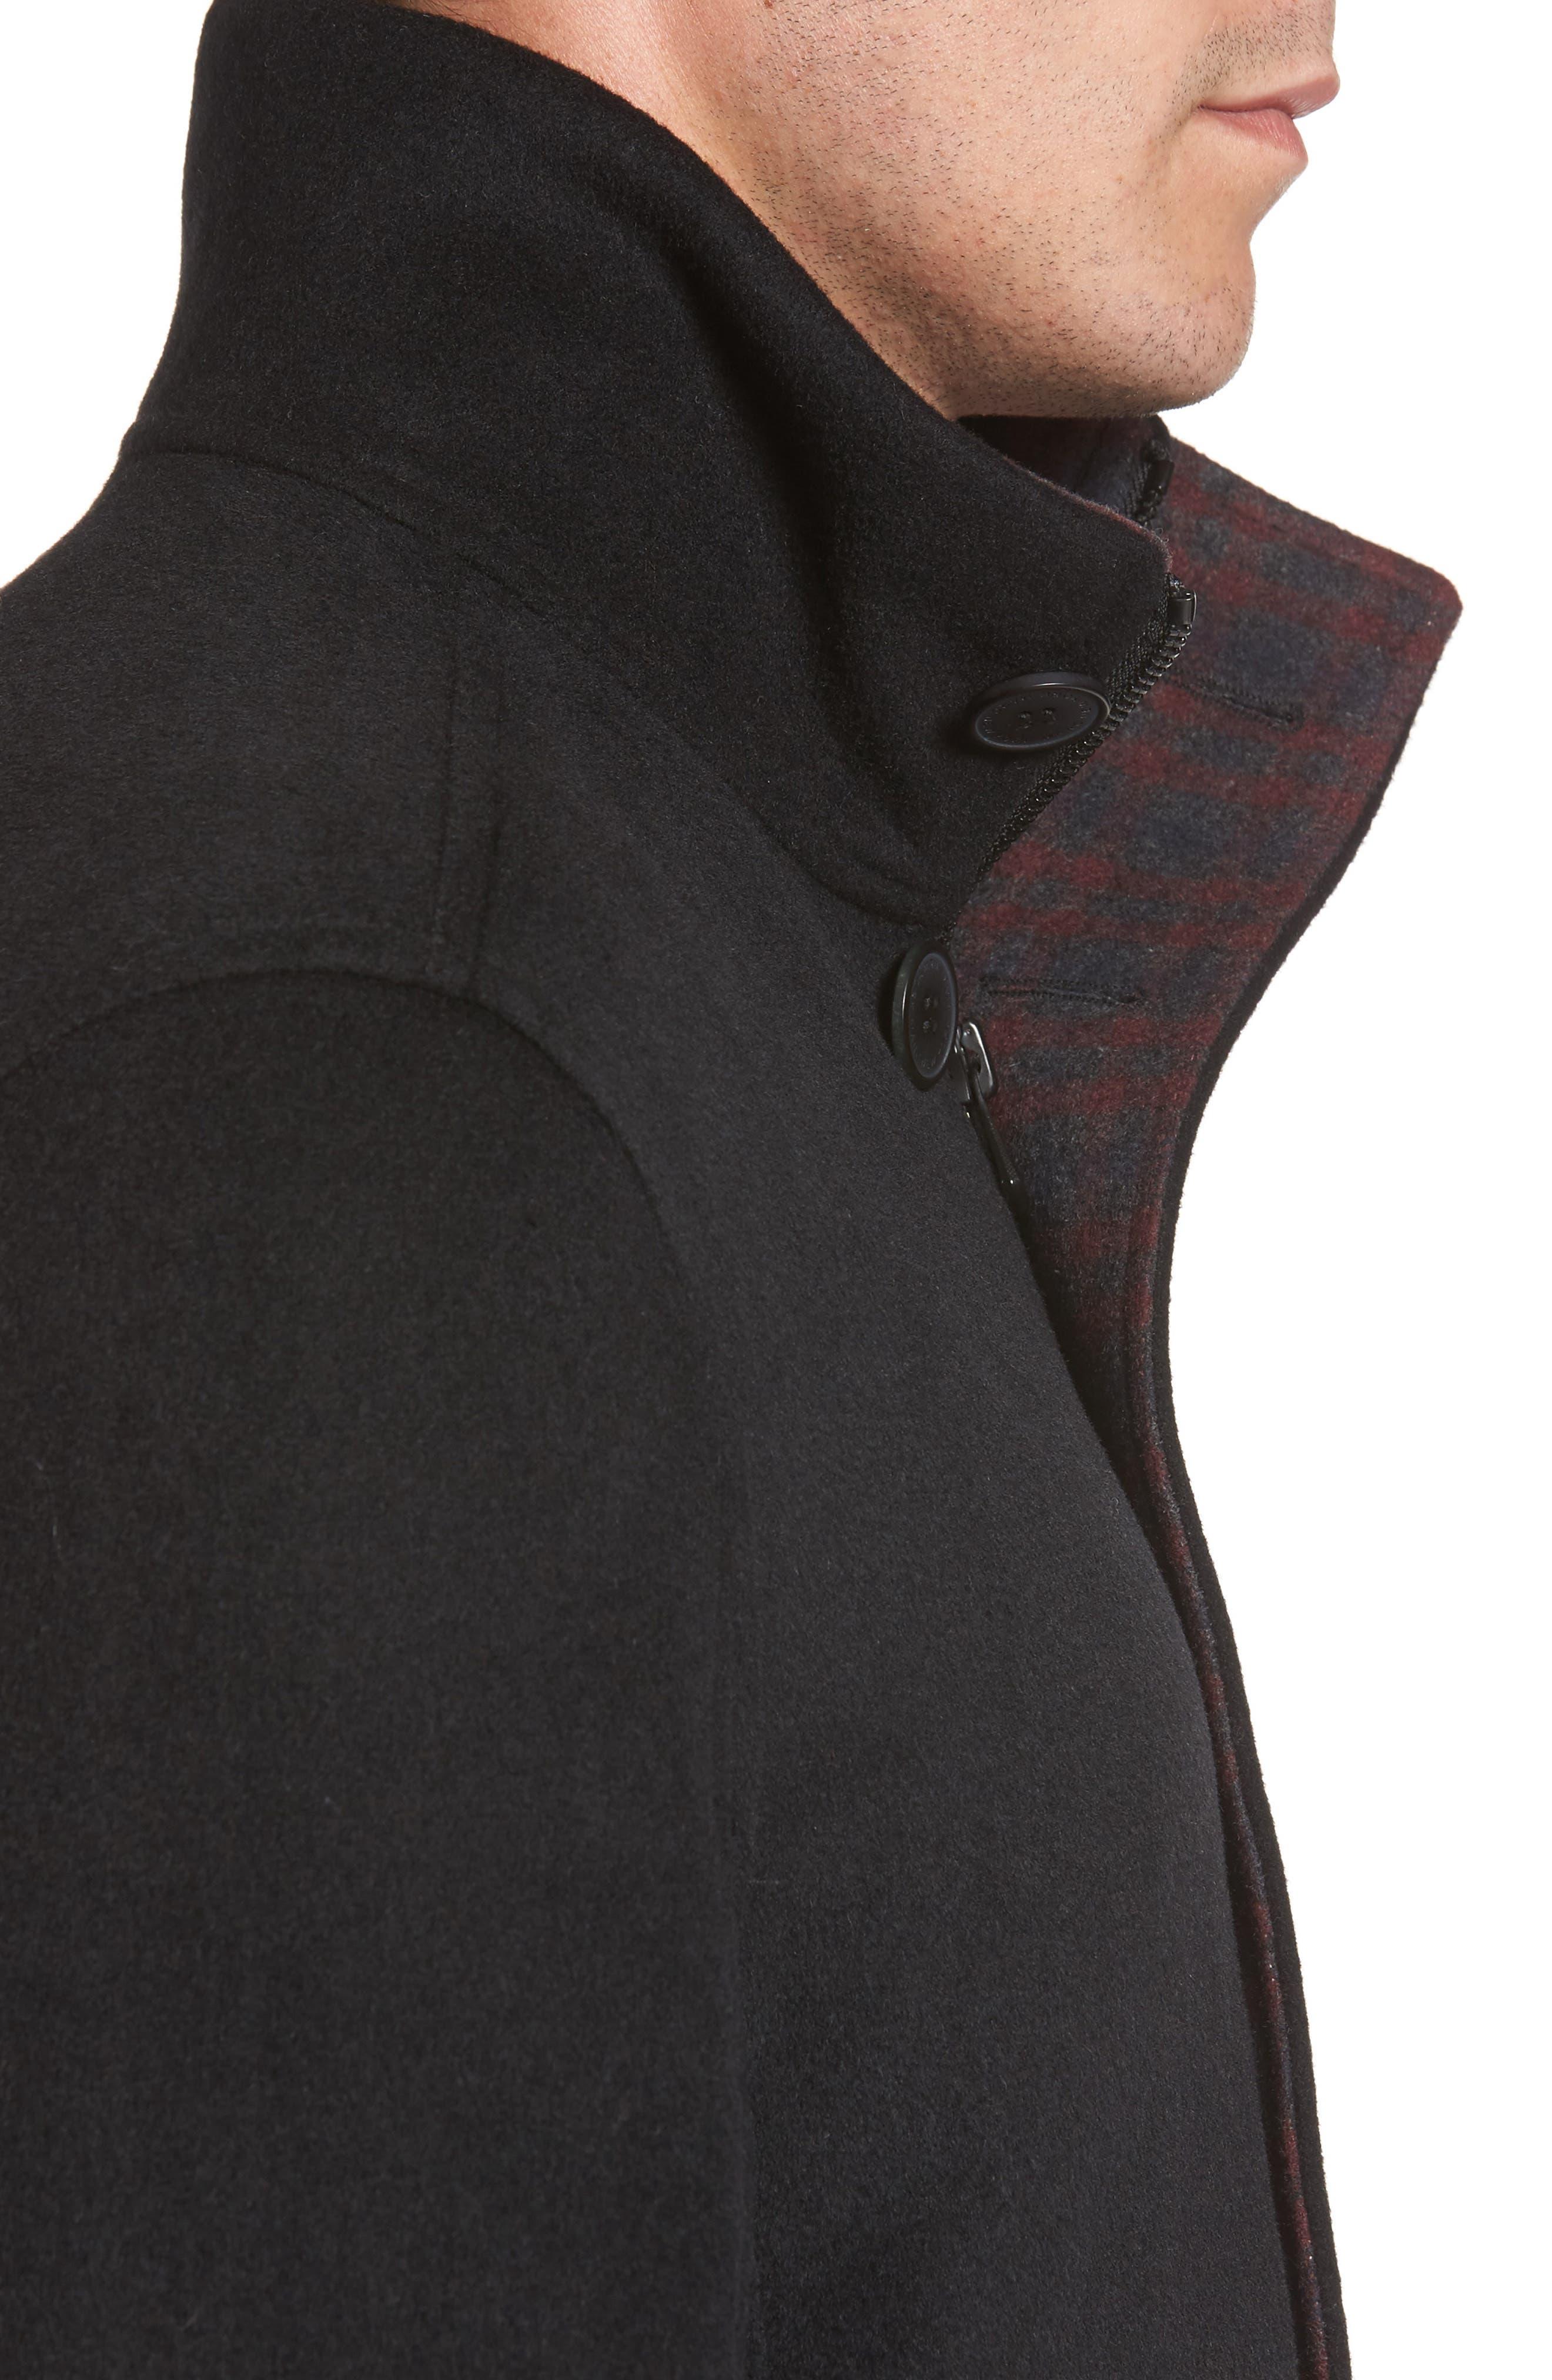 Double Face Wool Blend Car Coat,                             Alternate thumbnail 4, color,                             001